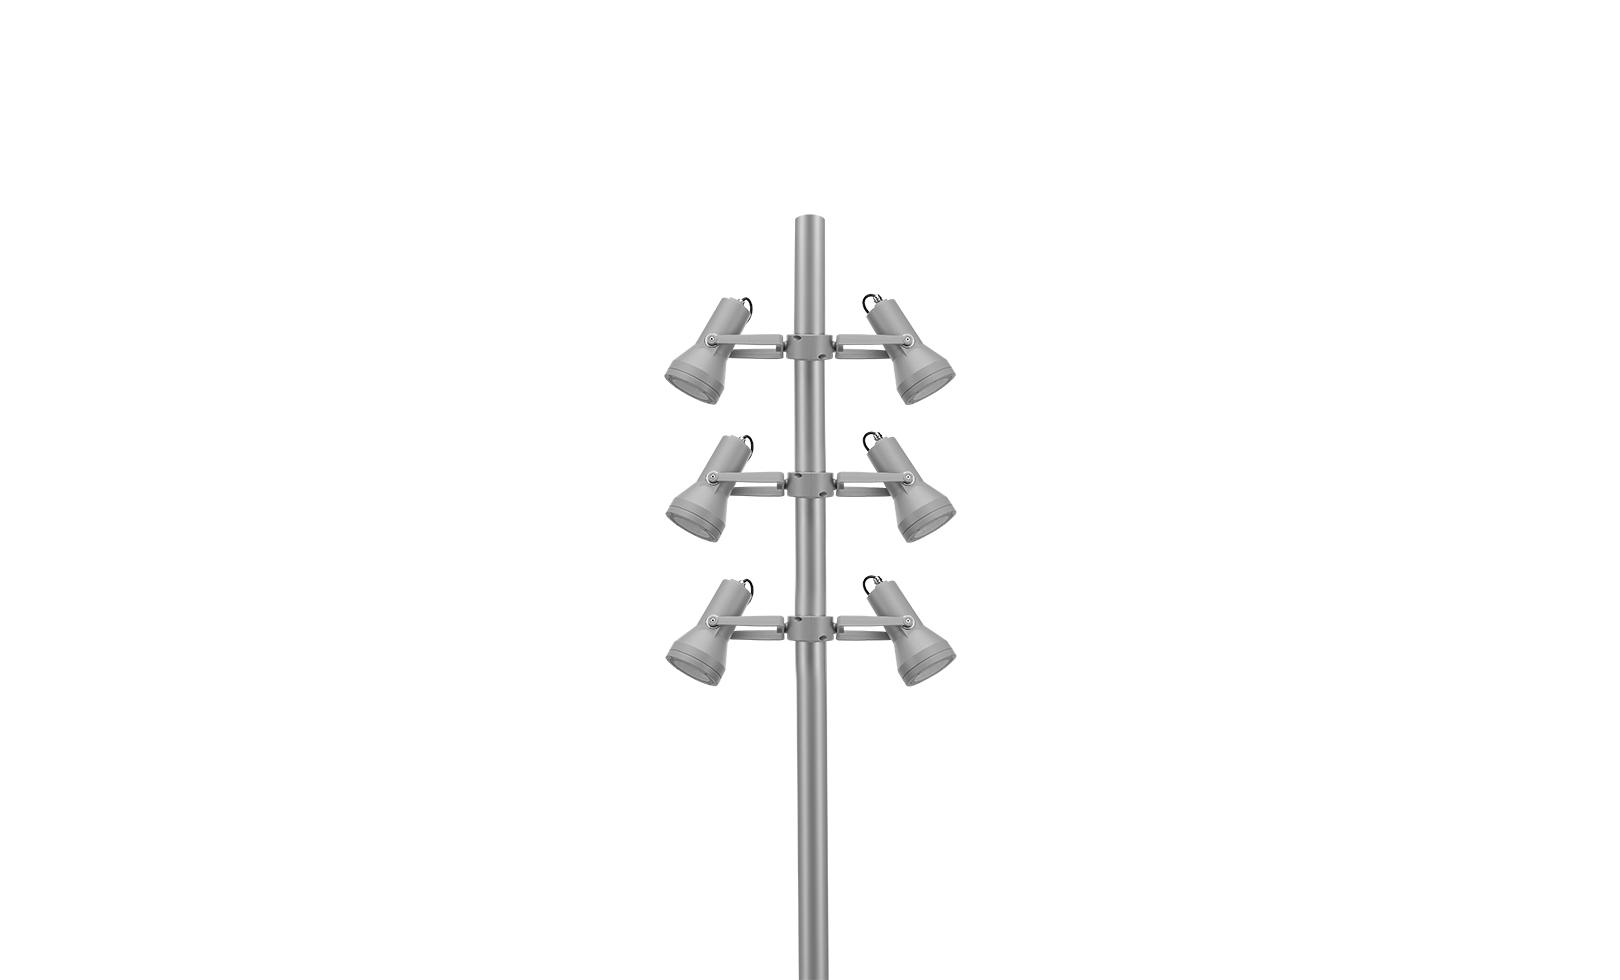 805002-805006 FLASH POLE MEDIUM COB LED 18W 5